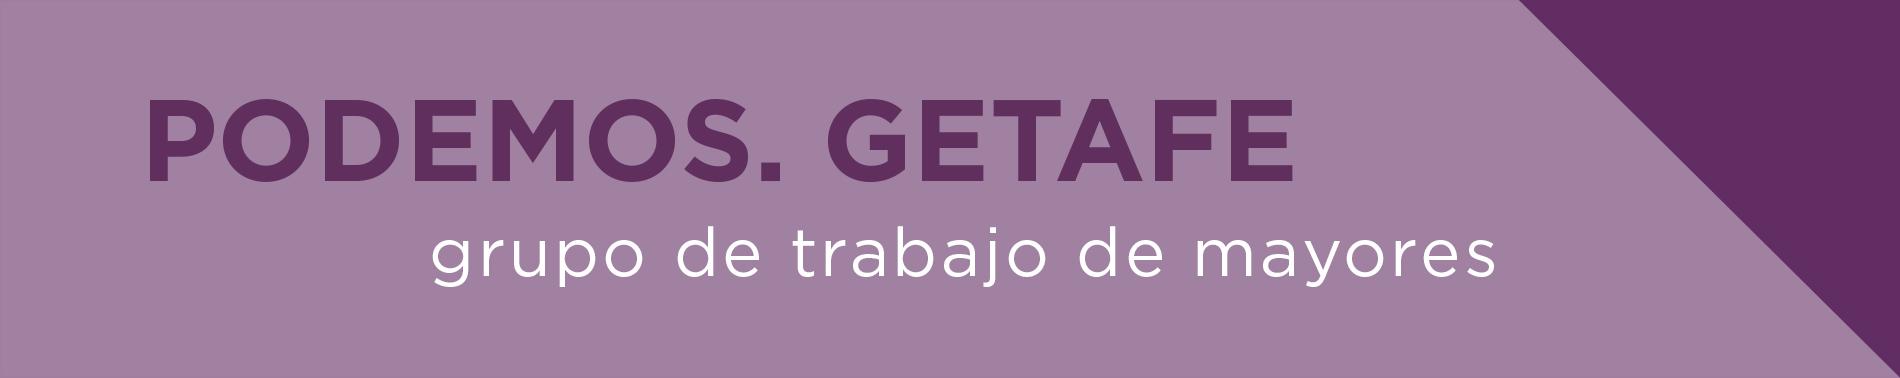 Convocatoria grupo de mayores: viernes 3 de noviembre 2017